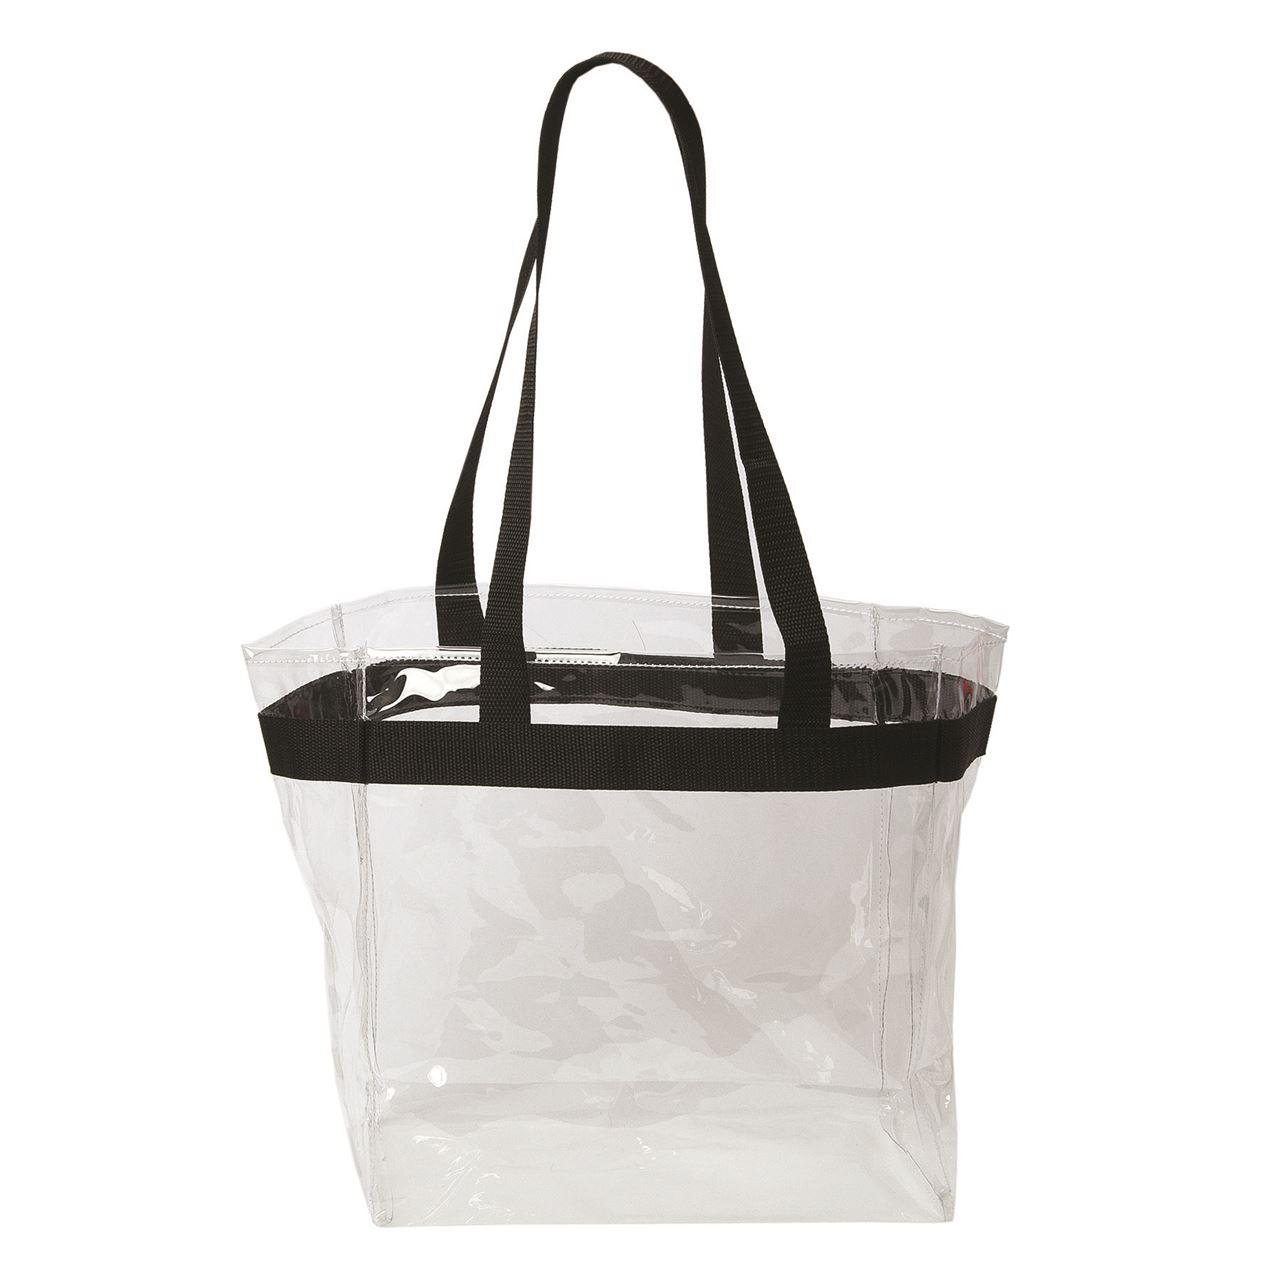 Image result for clear vinyl tote bag